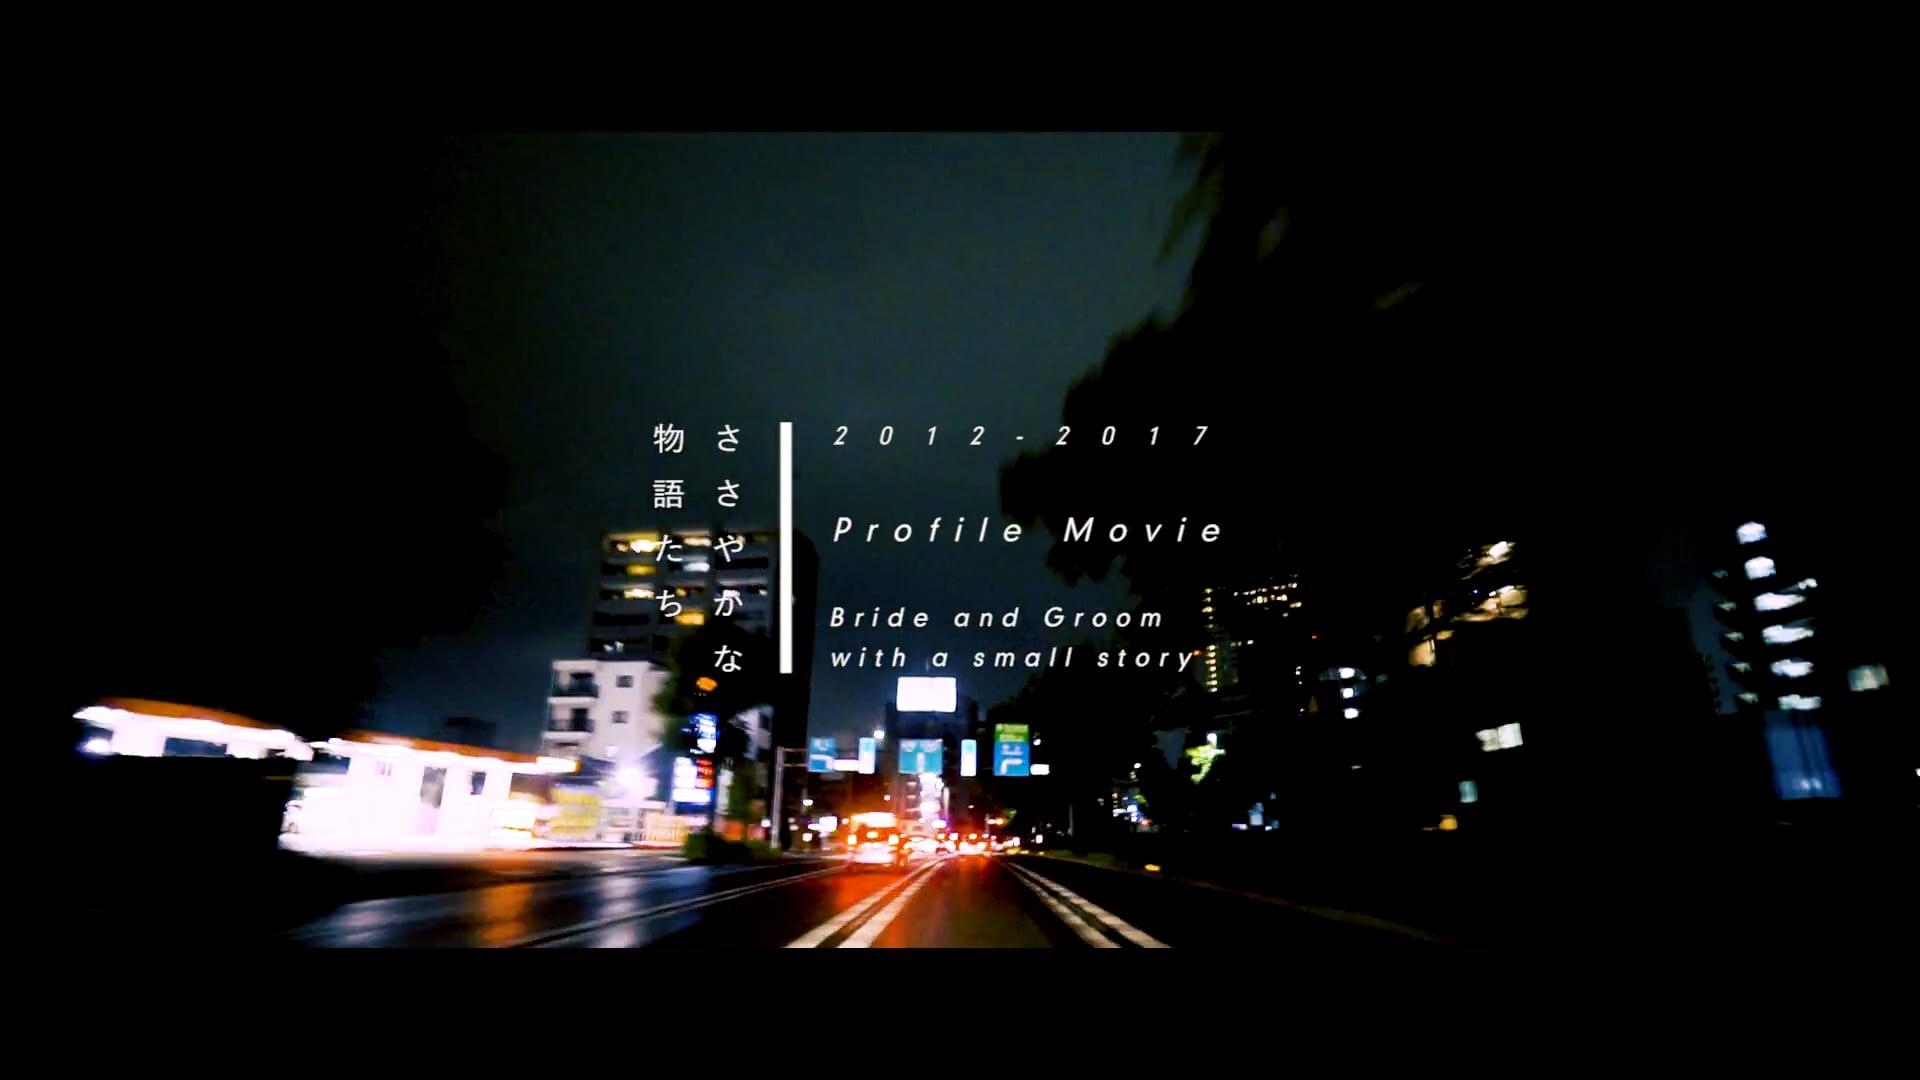 profile movie digest2012-1017